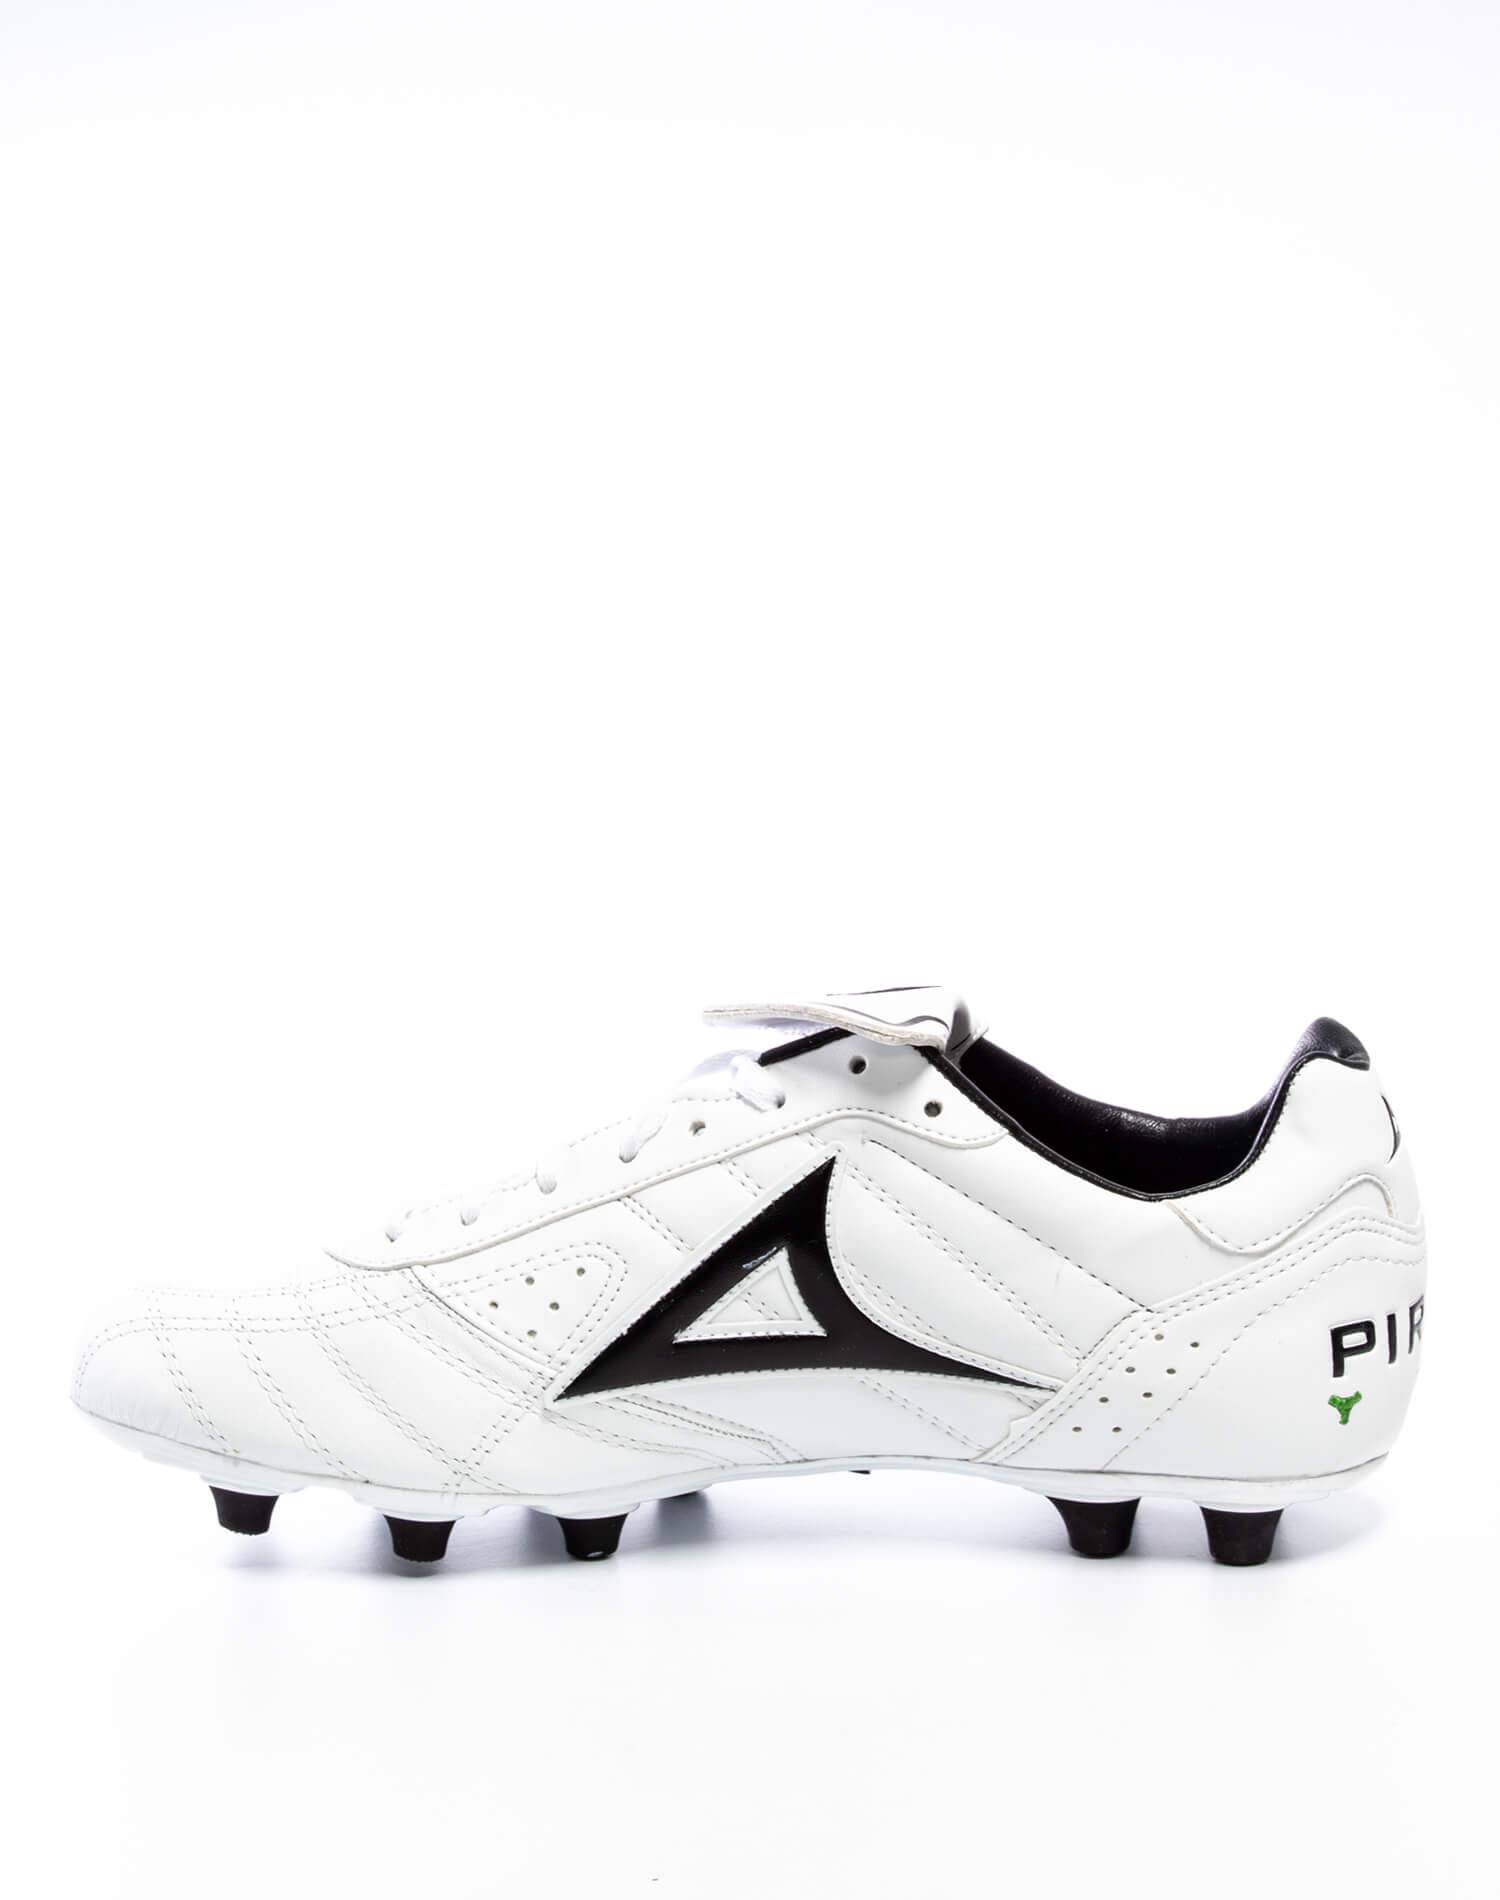 662eeb7b0d381 Pirma Brasil Modelo 0501 Piel Blanco – Golero Sport